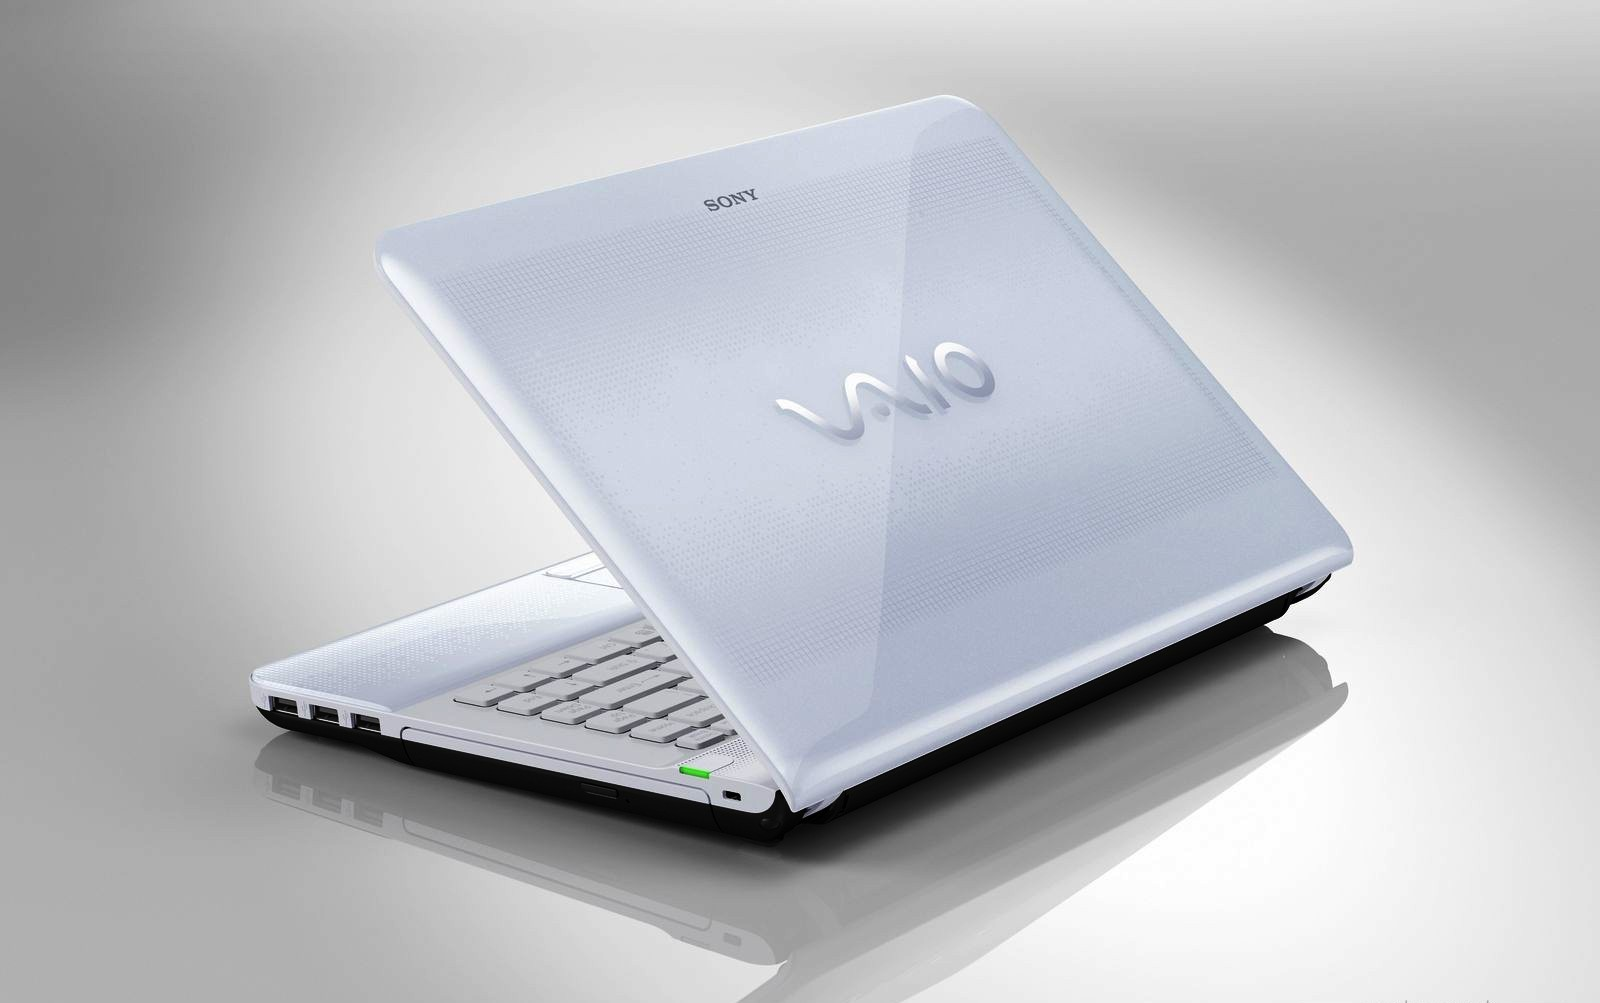 Sony Vaio, a nice machine